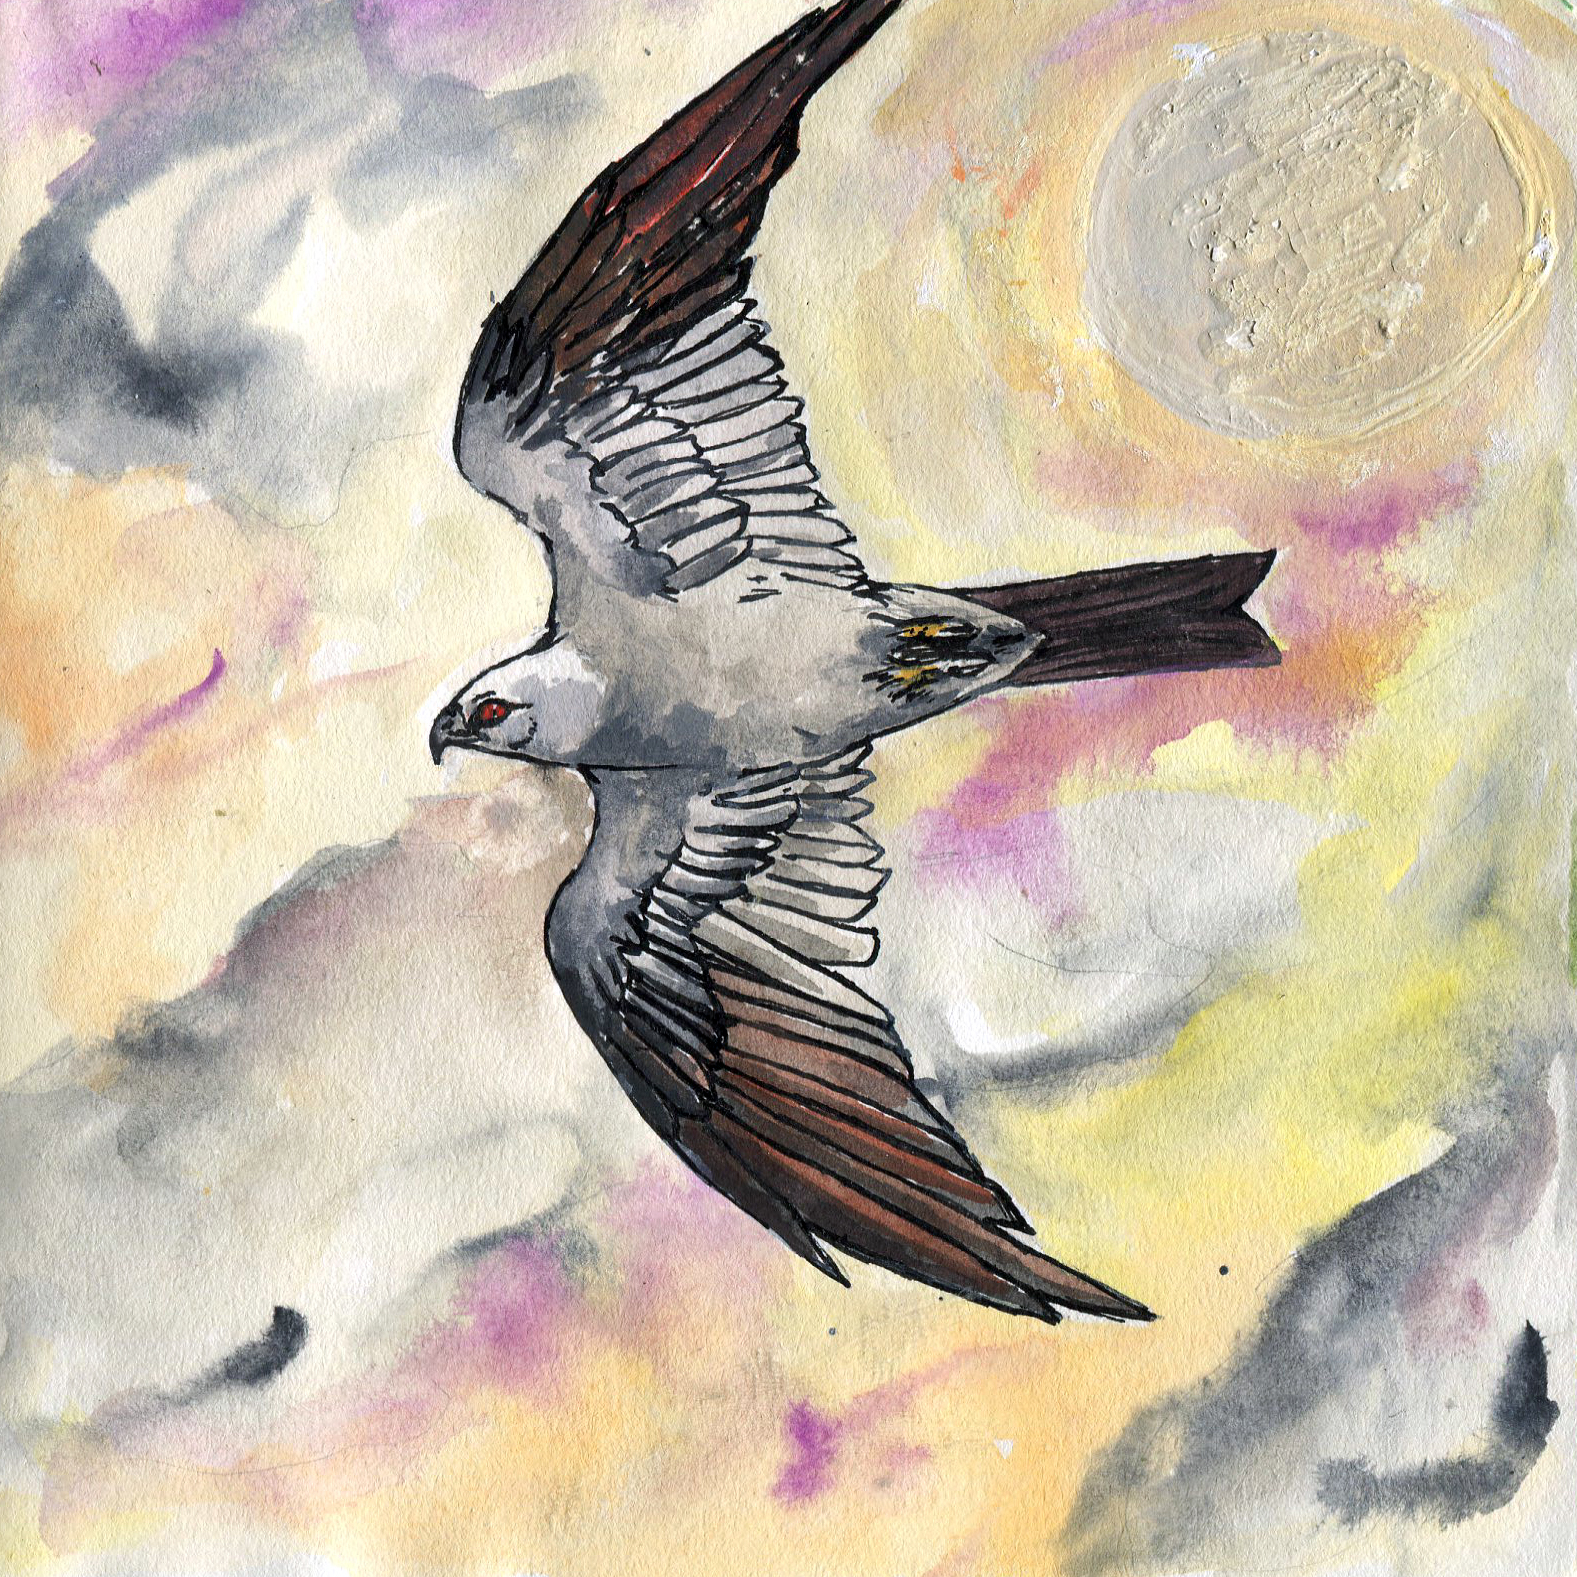 308. Mississippi Kite